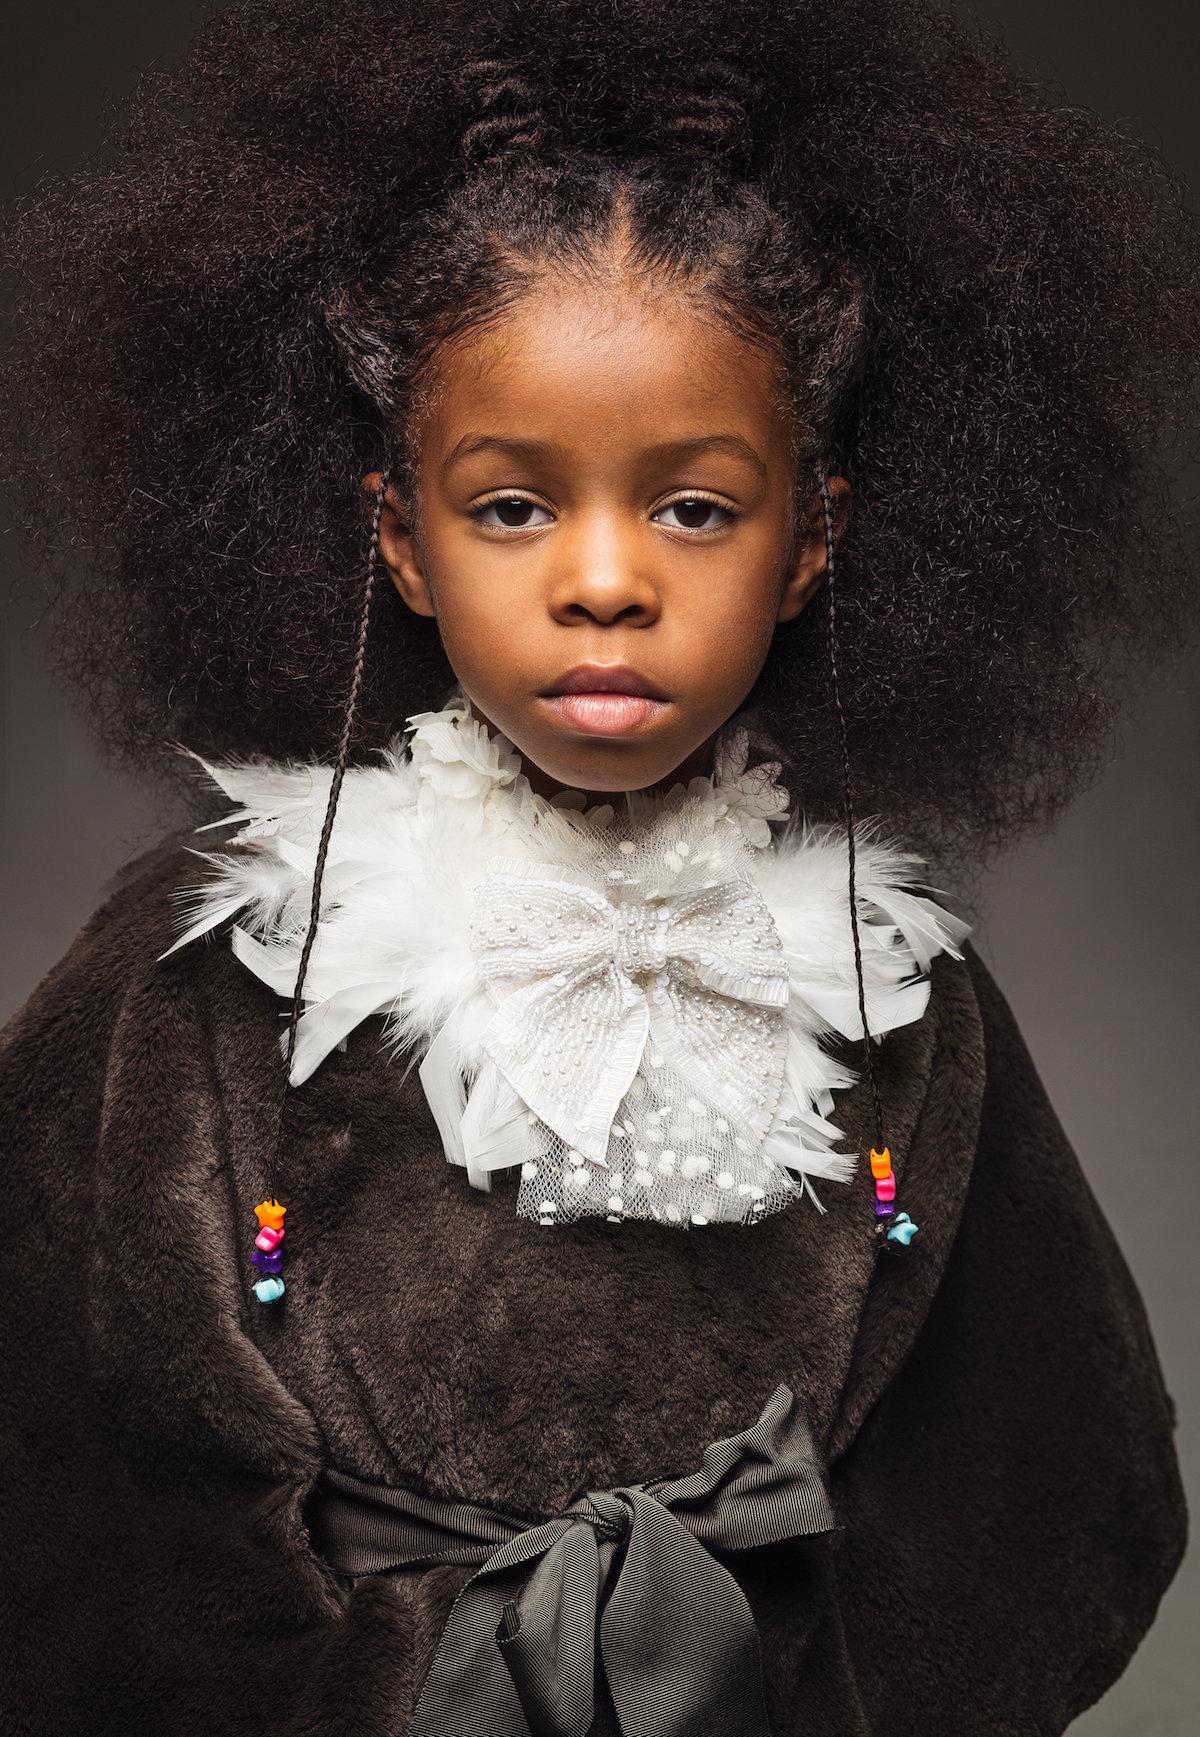 Afro-art-creative-soul-photography-12.jpg